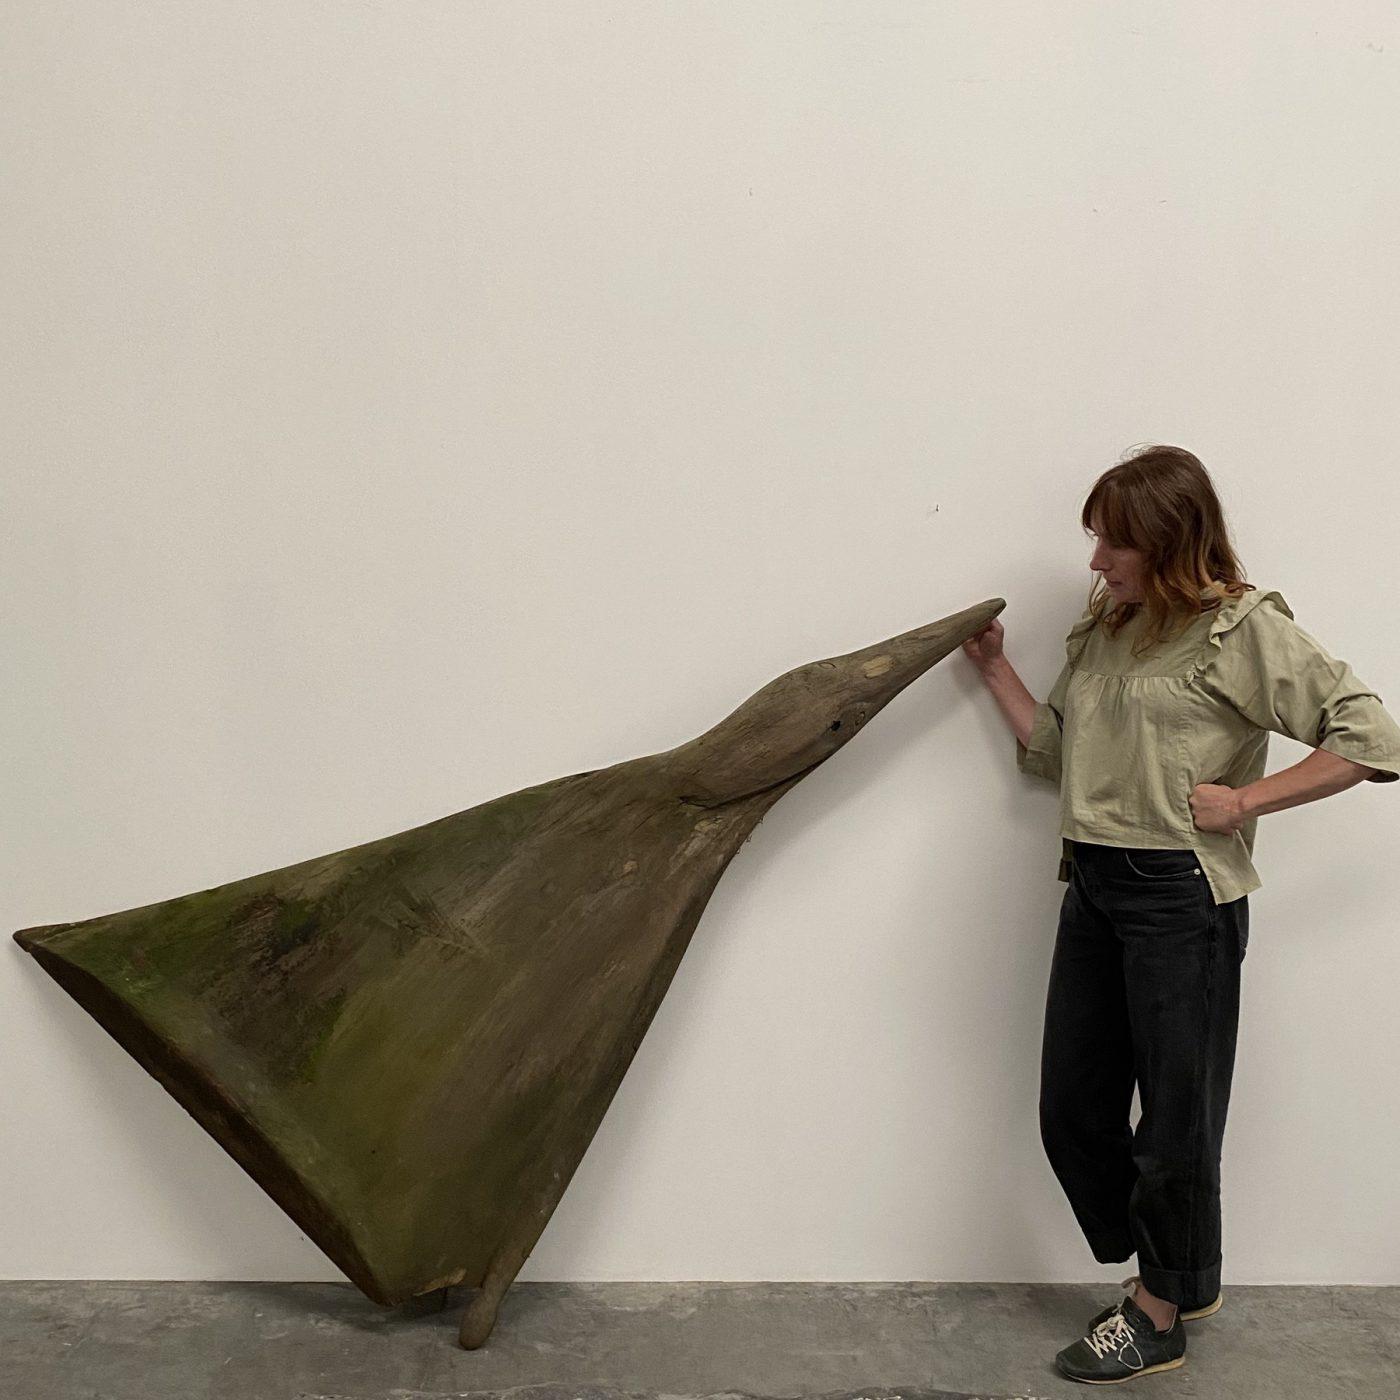 objet-vagabond-wooden-sculpture0003